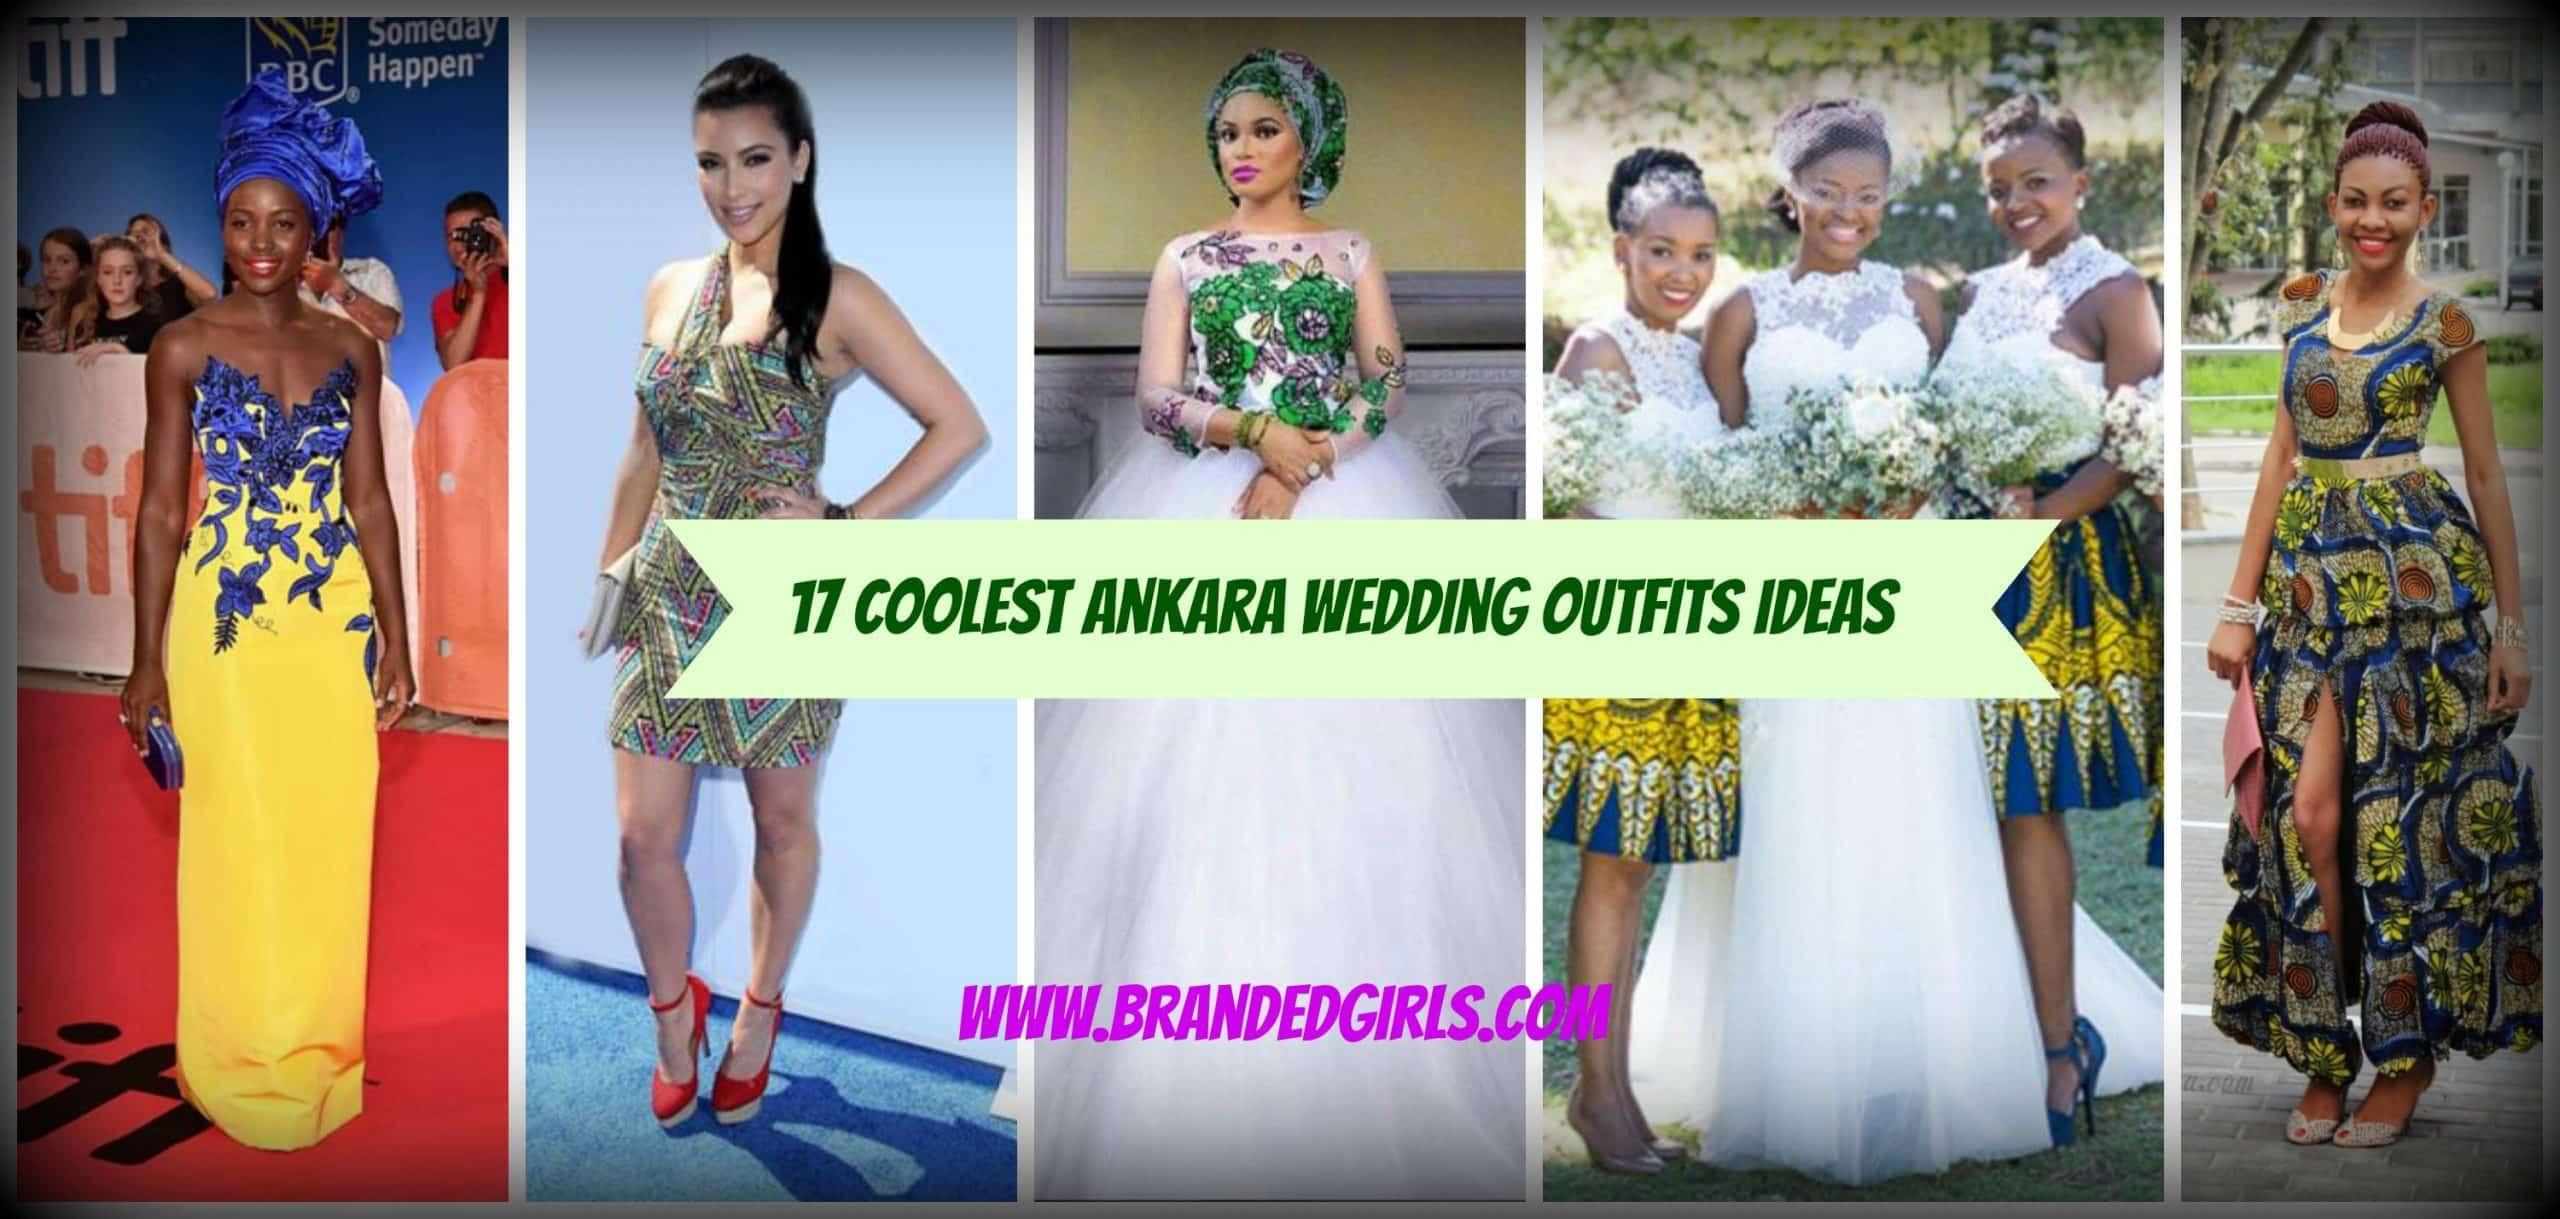 PicMonkey-Image Ankara Styles for Wedding-17 Cool Ankara Dresses for Wedding 2017